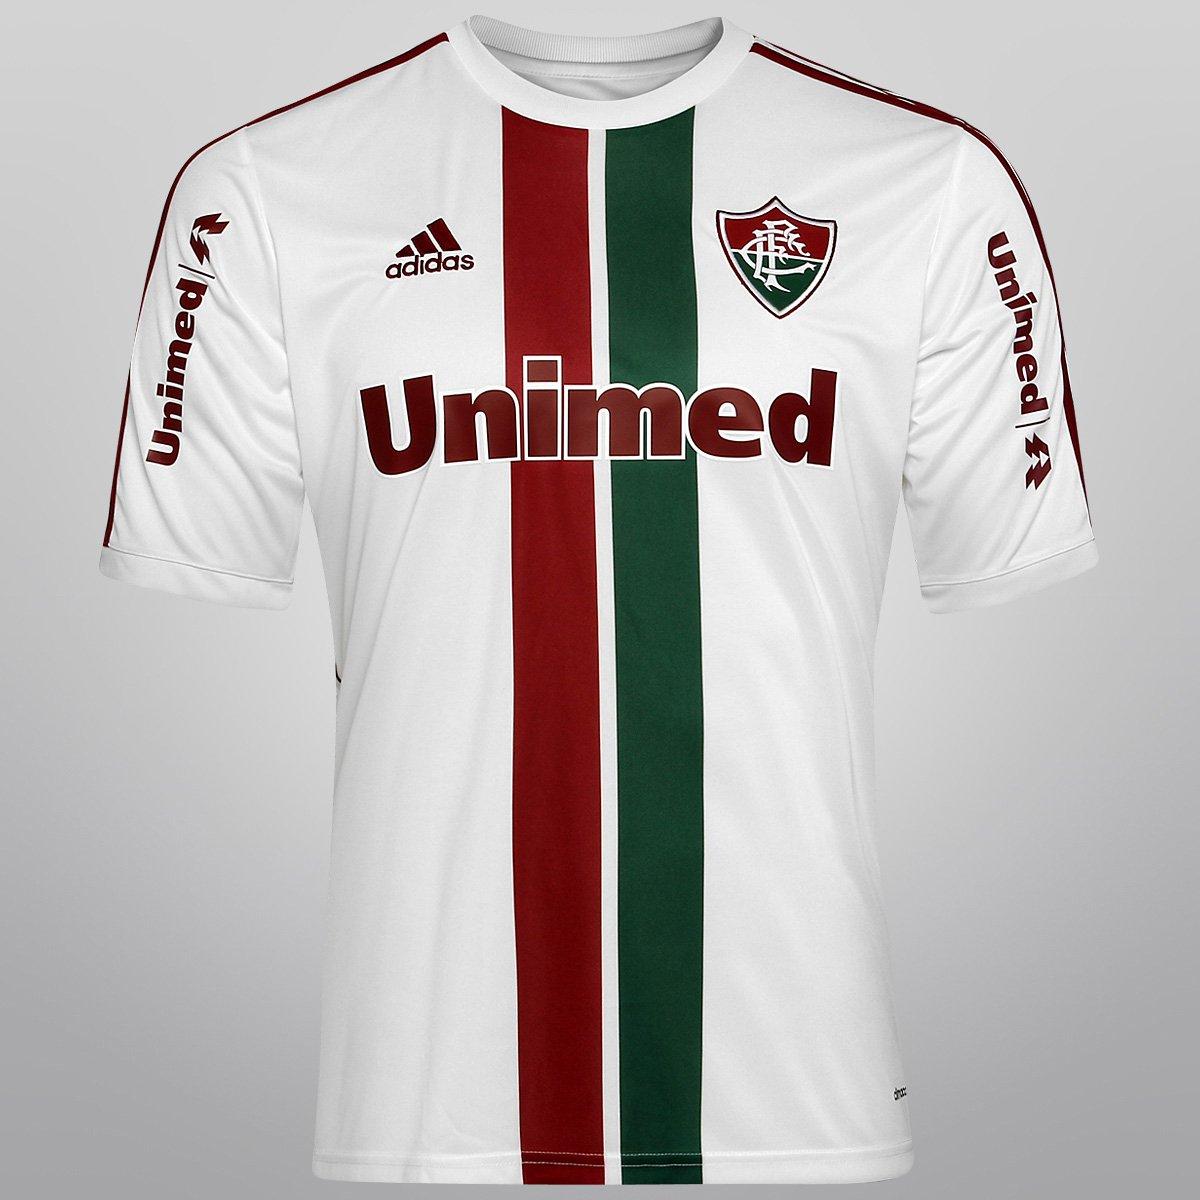 Novas camisas do Fluminense de Feira 2018 WA Sport